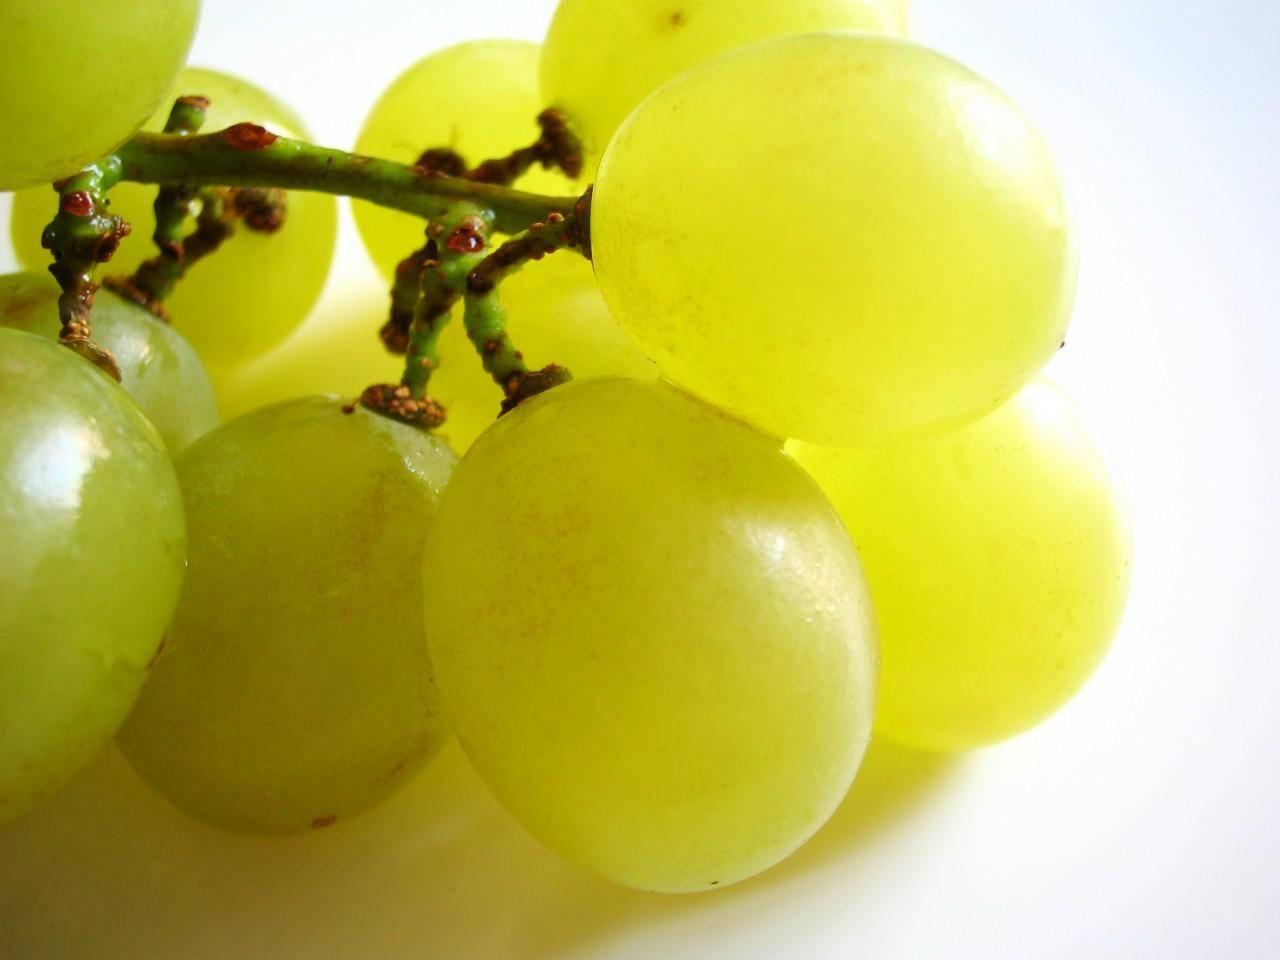 اهمیت مصرف انگور برای حفظ سلامتی بدن